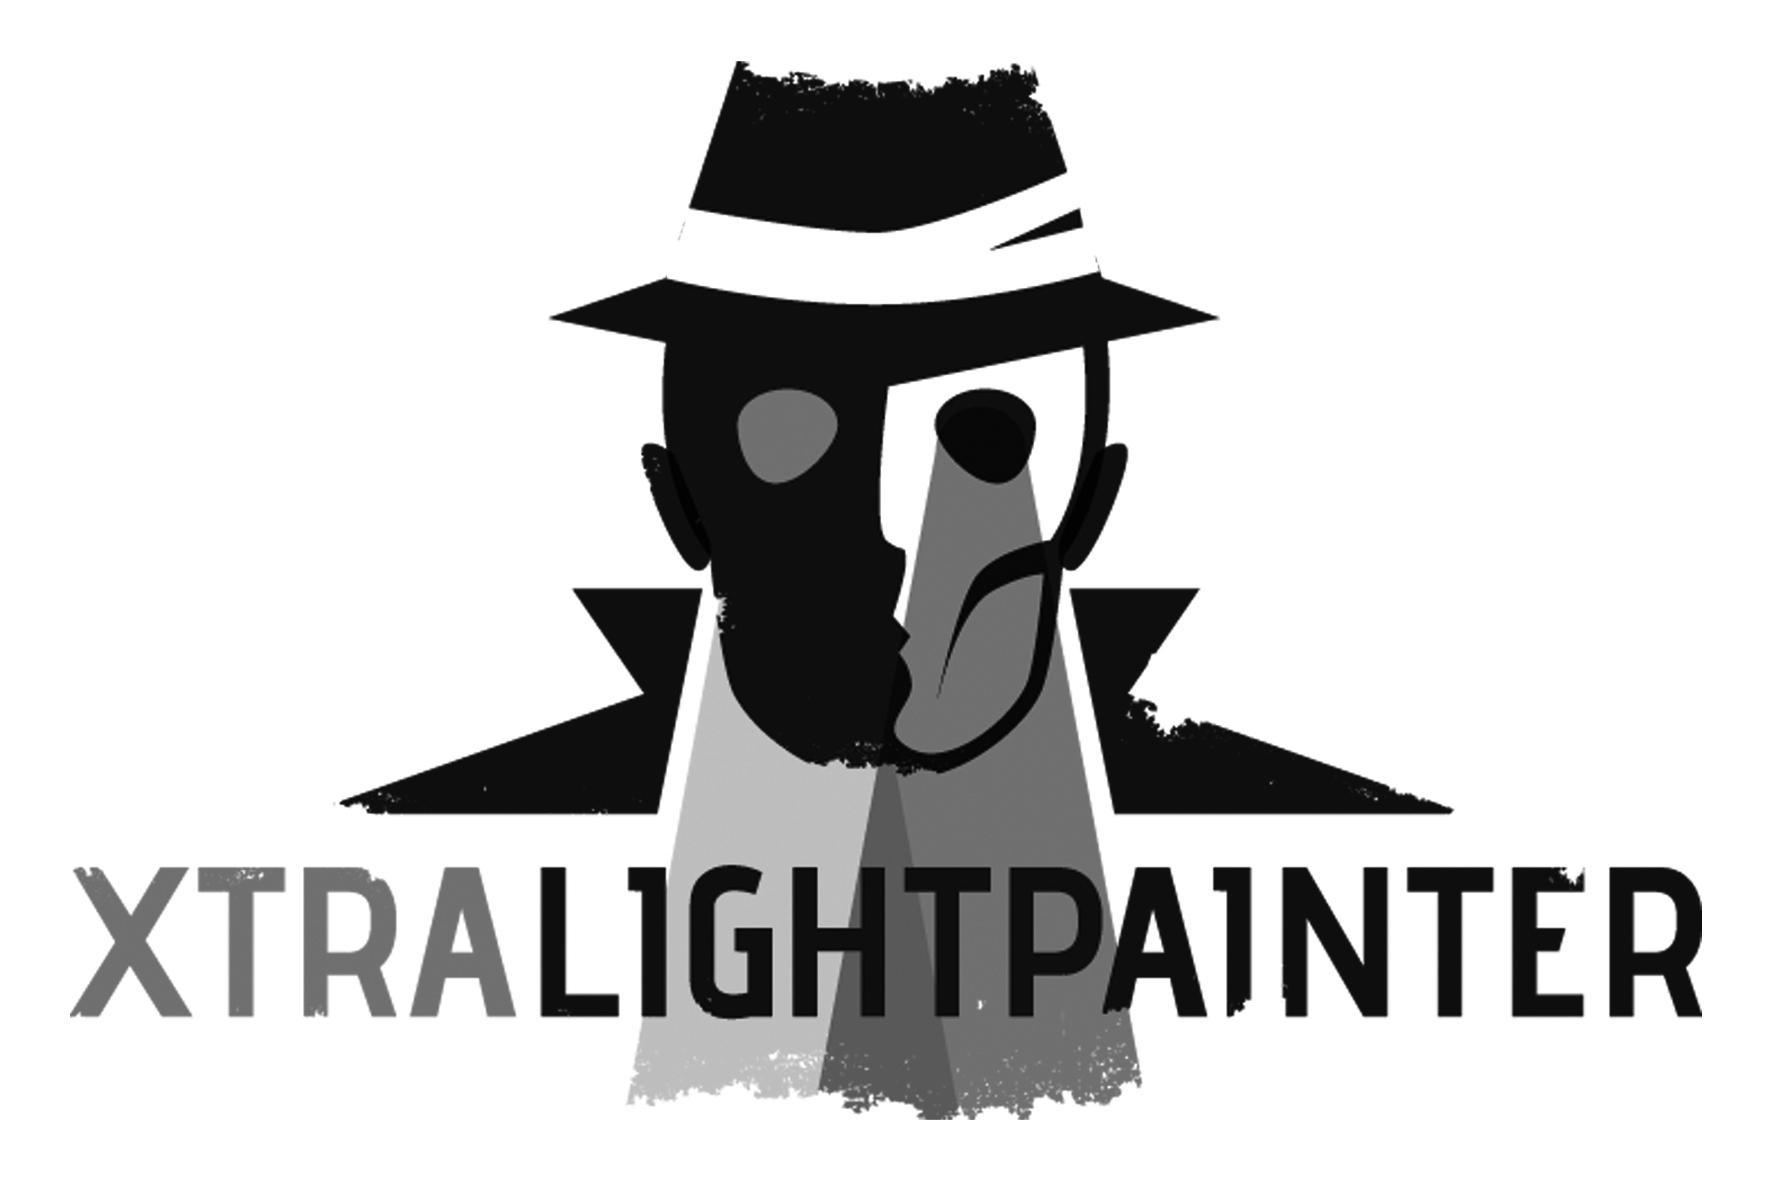 logo xtralightpainter 10x15-grau